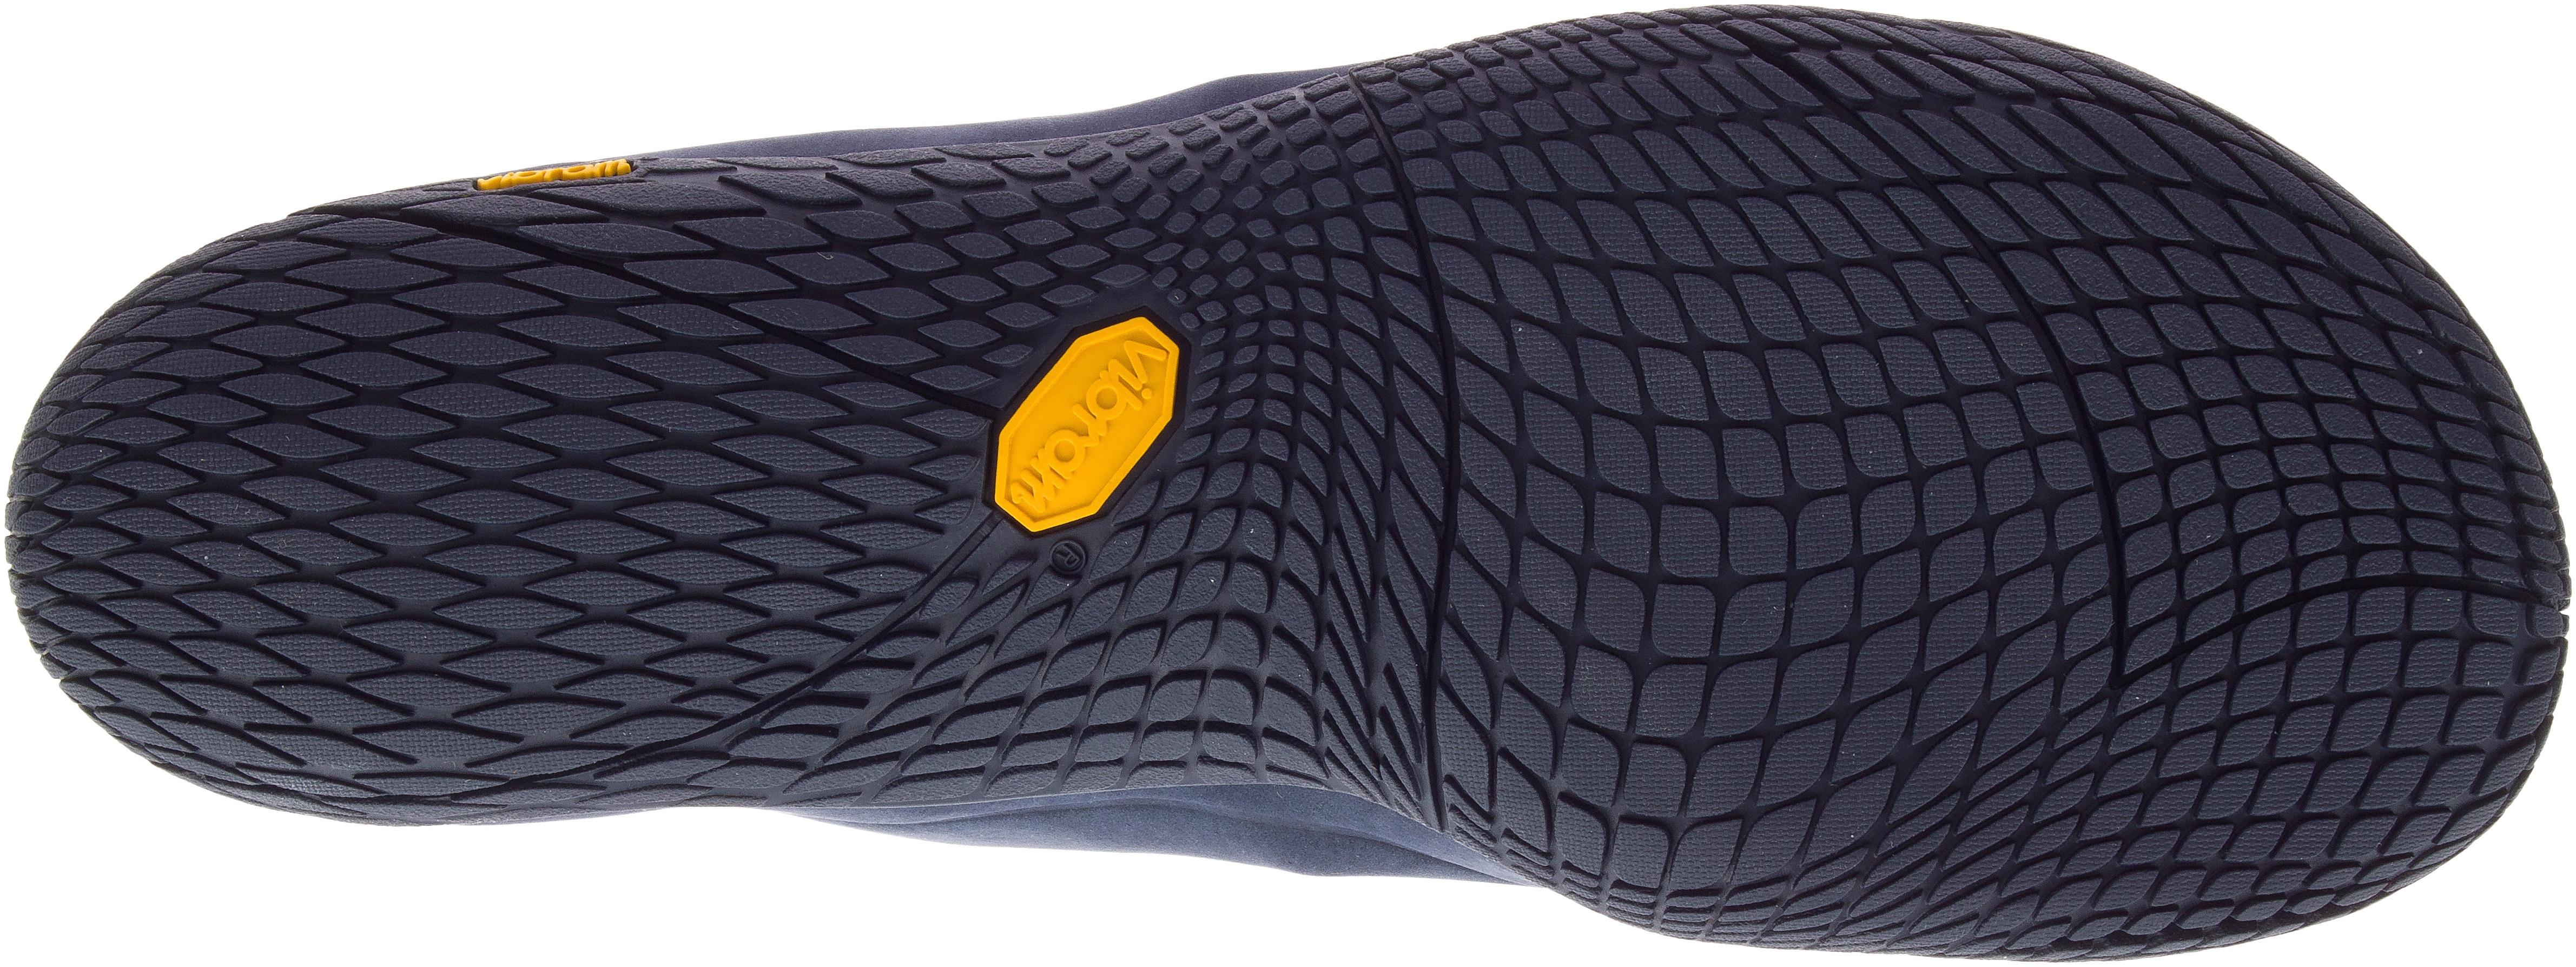 Vapor Glove Luna 3 Leather, Navy